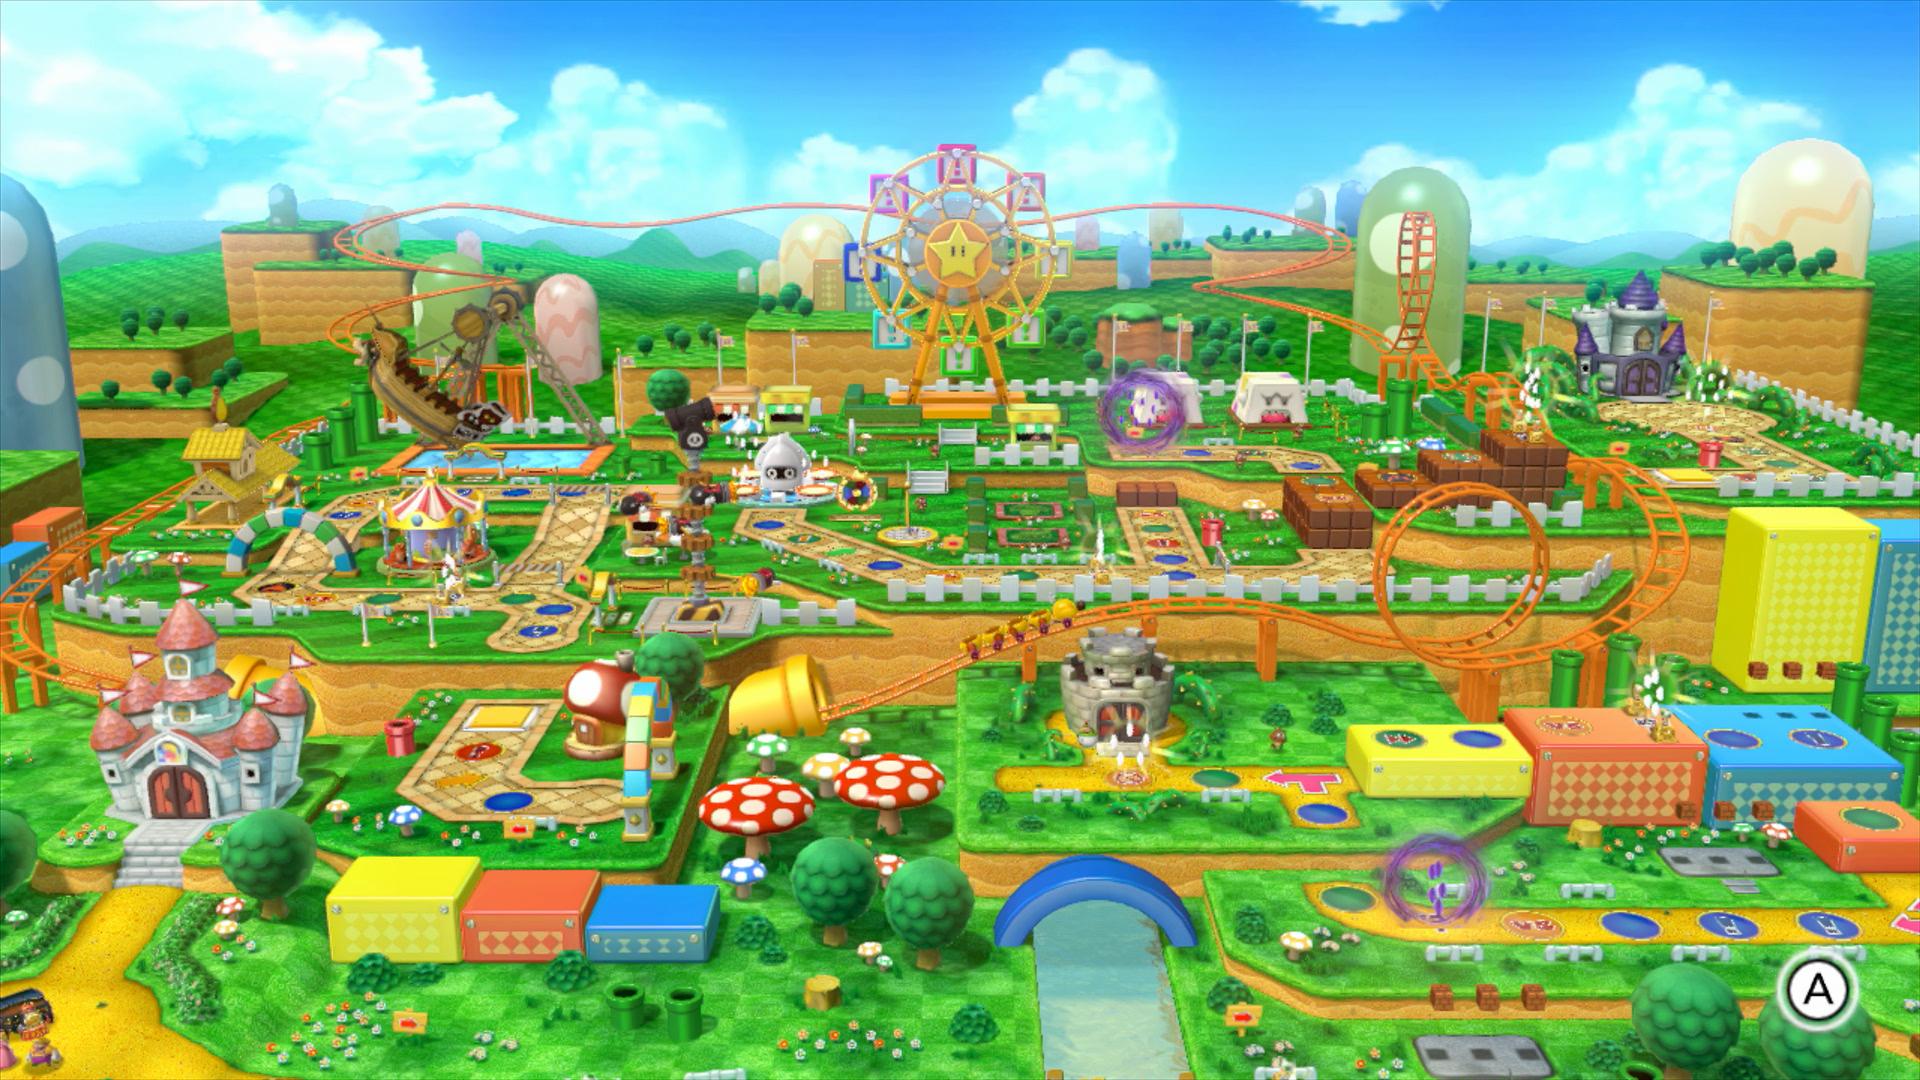 WiiU_MP10_Screens_E3_06.png